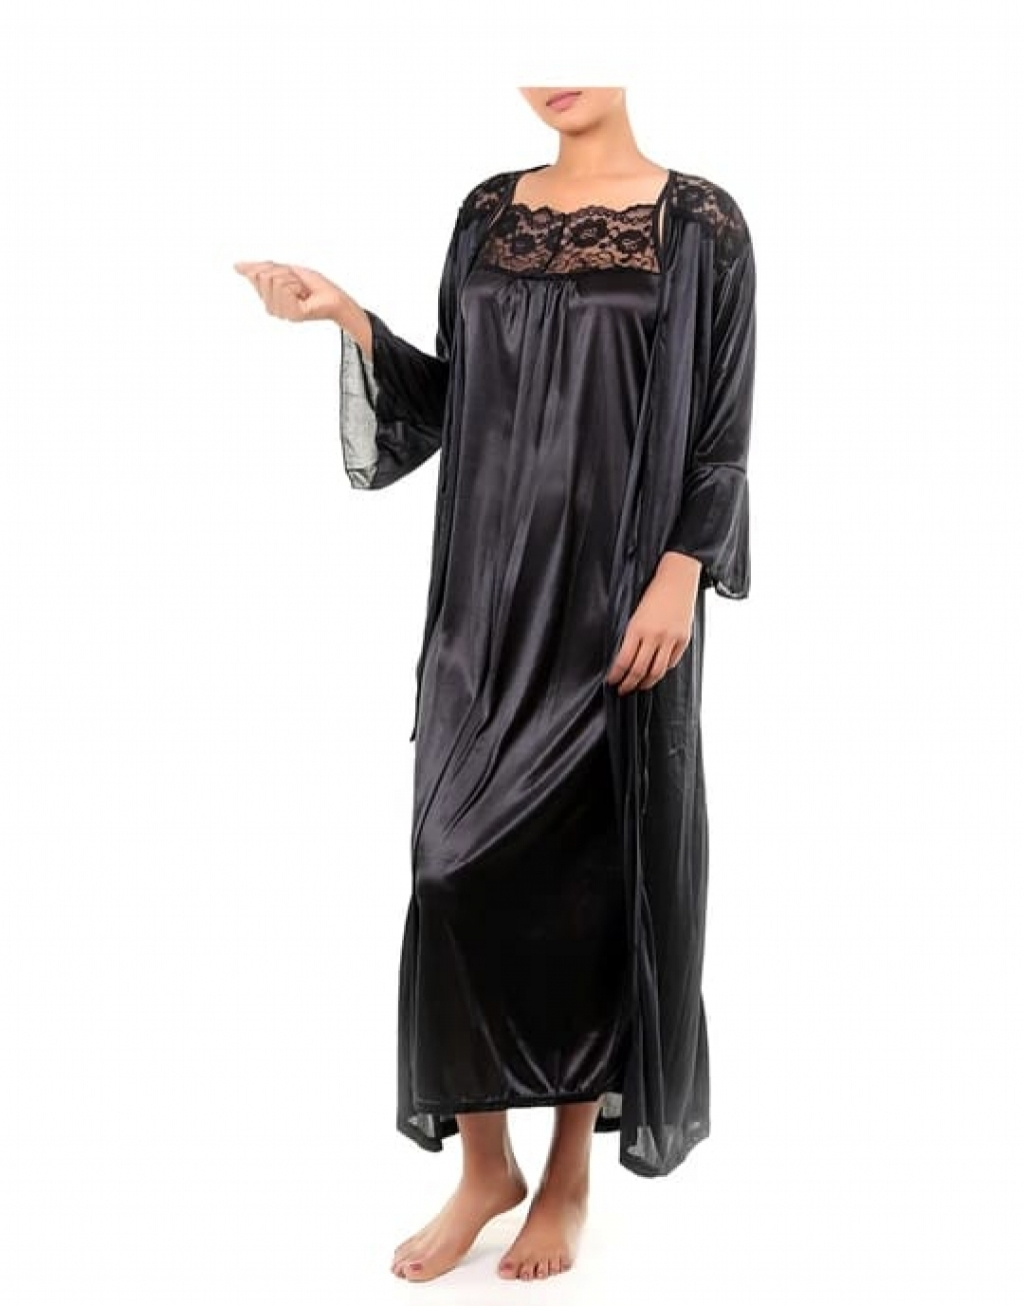 Buy LOSHA 3 PIECE NIGHTY SET in Pakistan | online shopping